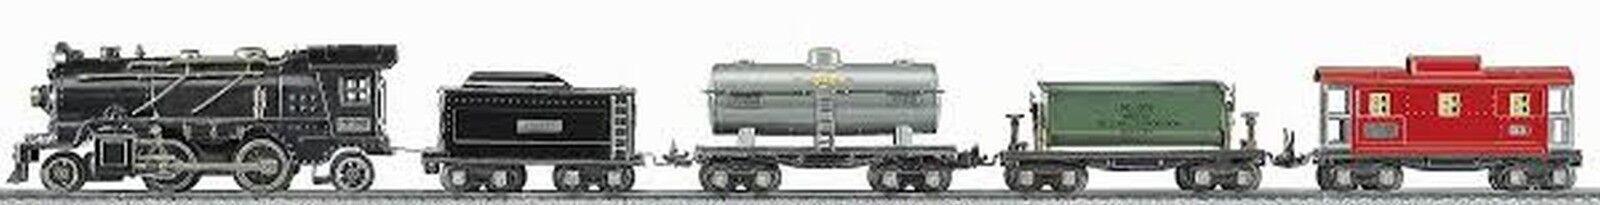 Lionel 6-51009 Celebration Series Series Series No. 269E Loco & Tender Freight Train Set MIB  1e3a54